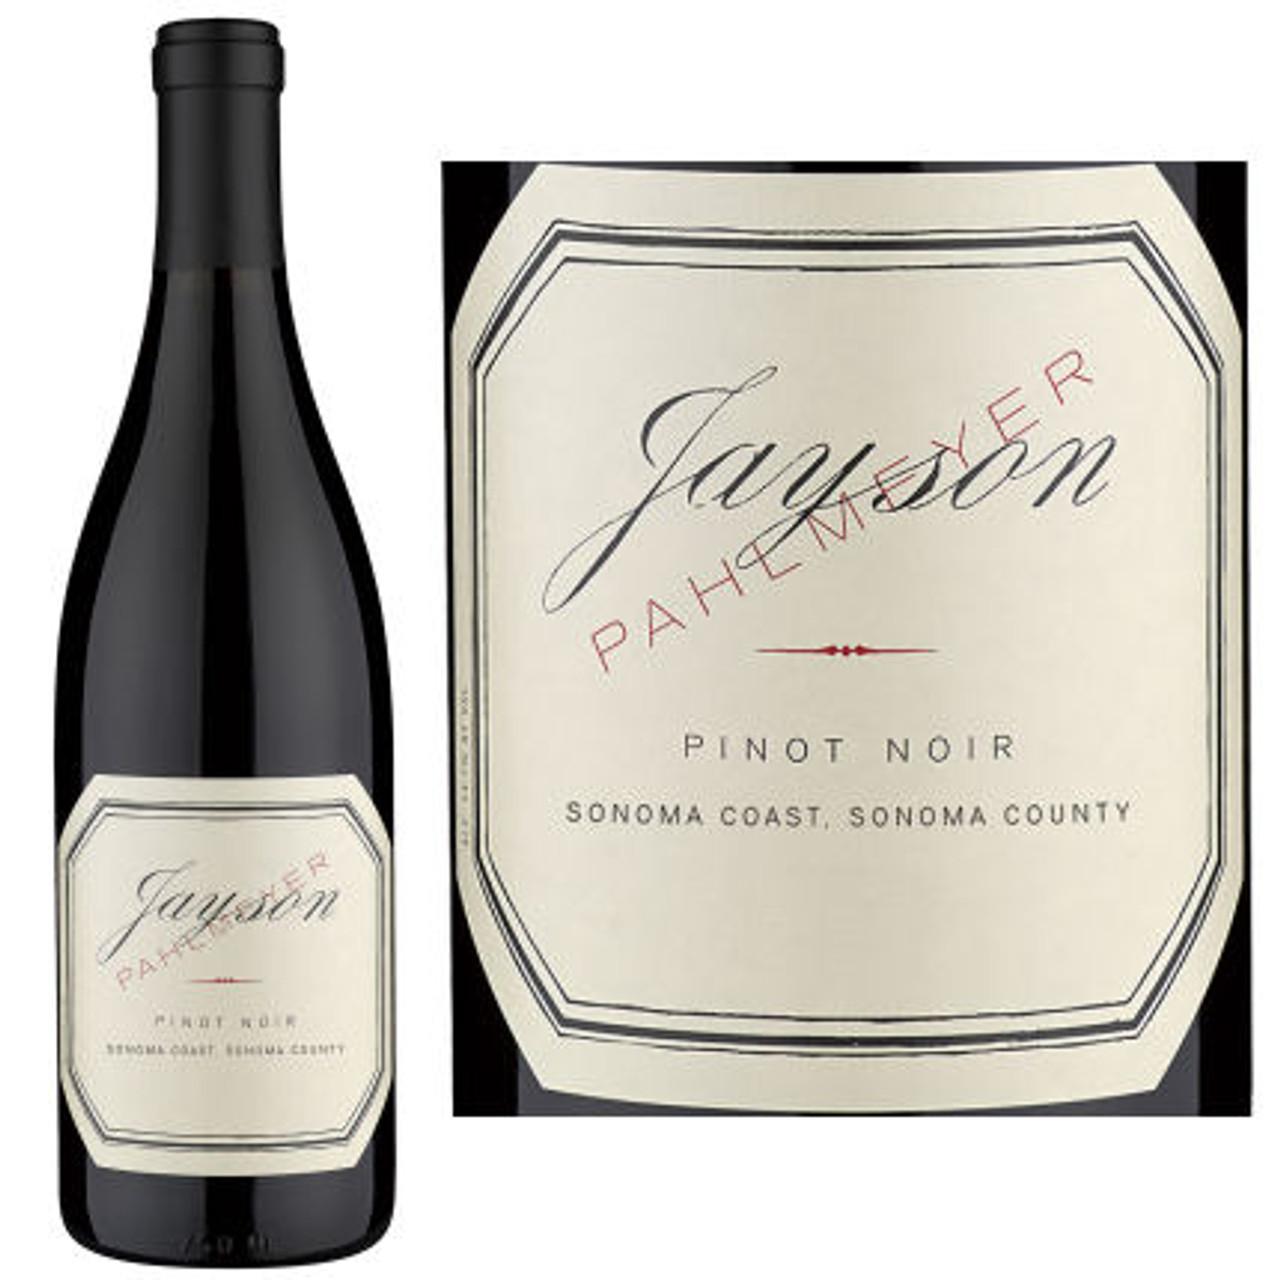 Jayson by Pahlmeyer Sonoma Coast Pinot Noir